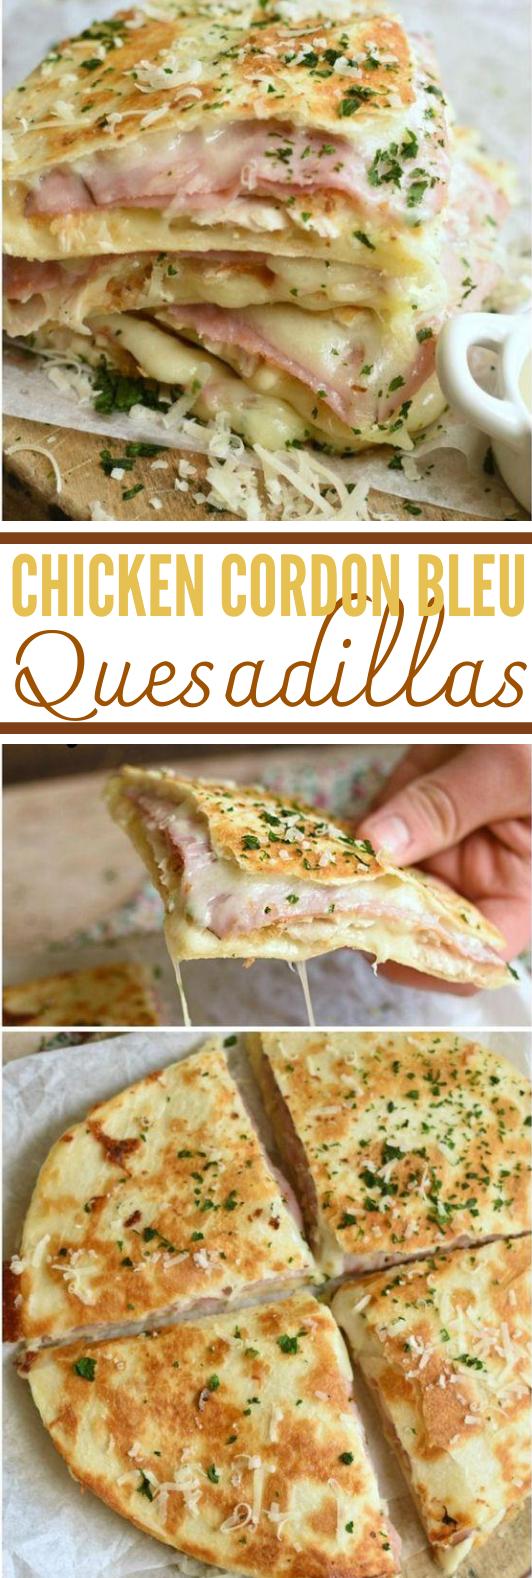 Chicken Cordon Bleu Quesadillas #easy #lunch #dinner #chicken #wraps